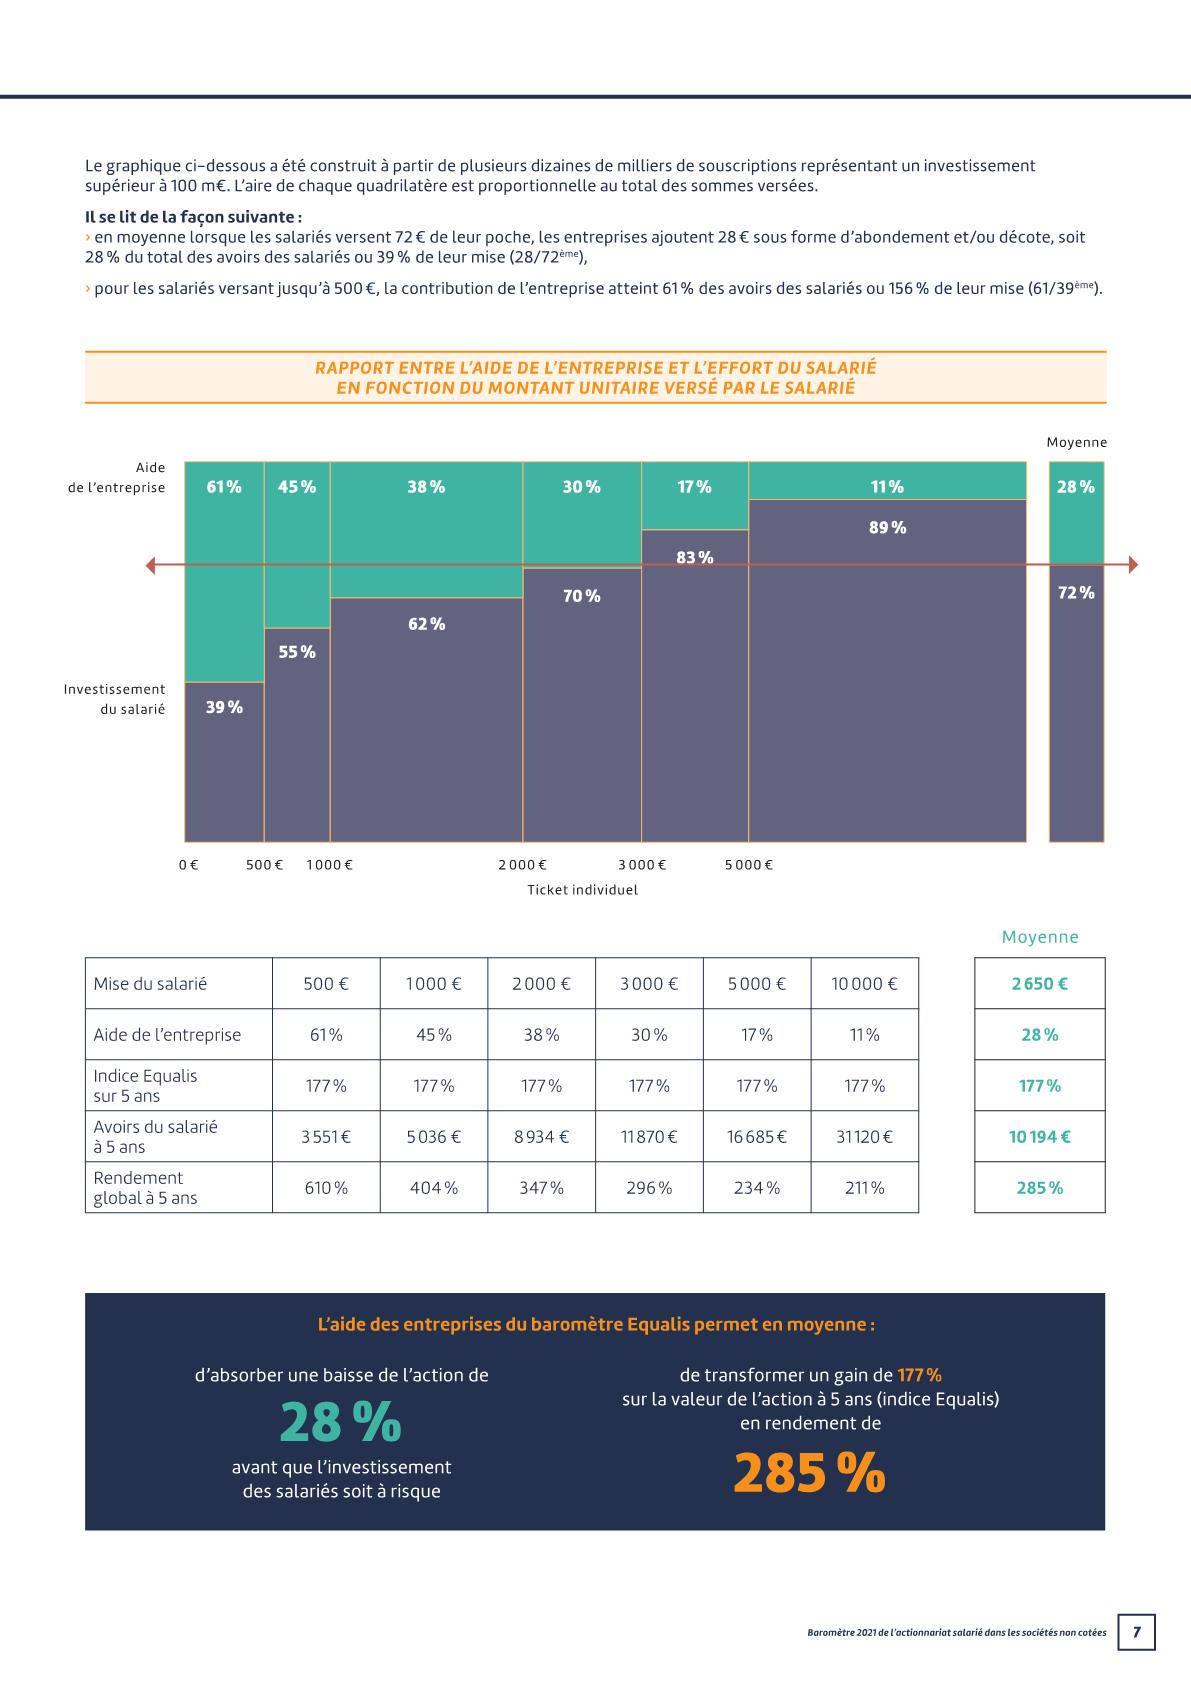 Baromètre_Equalis_Rapport_2021_web7